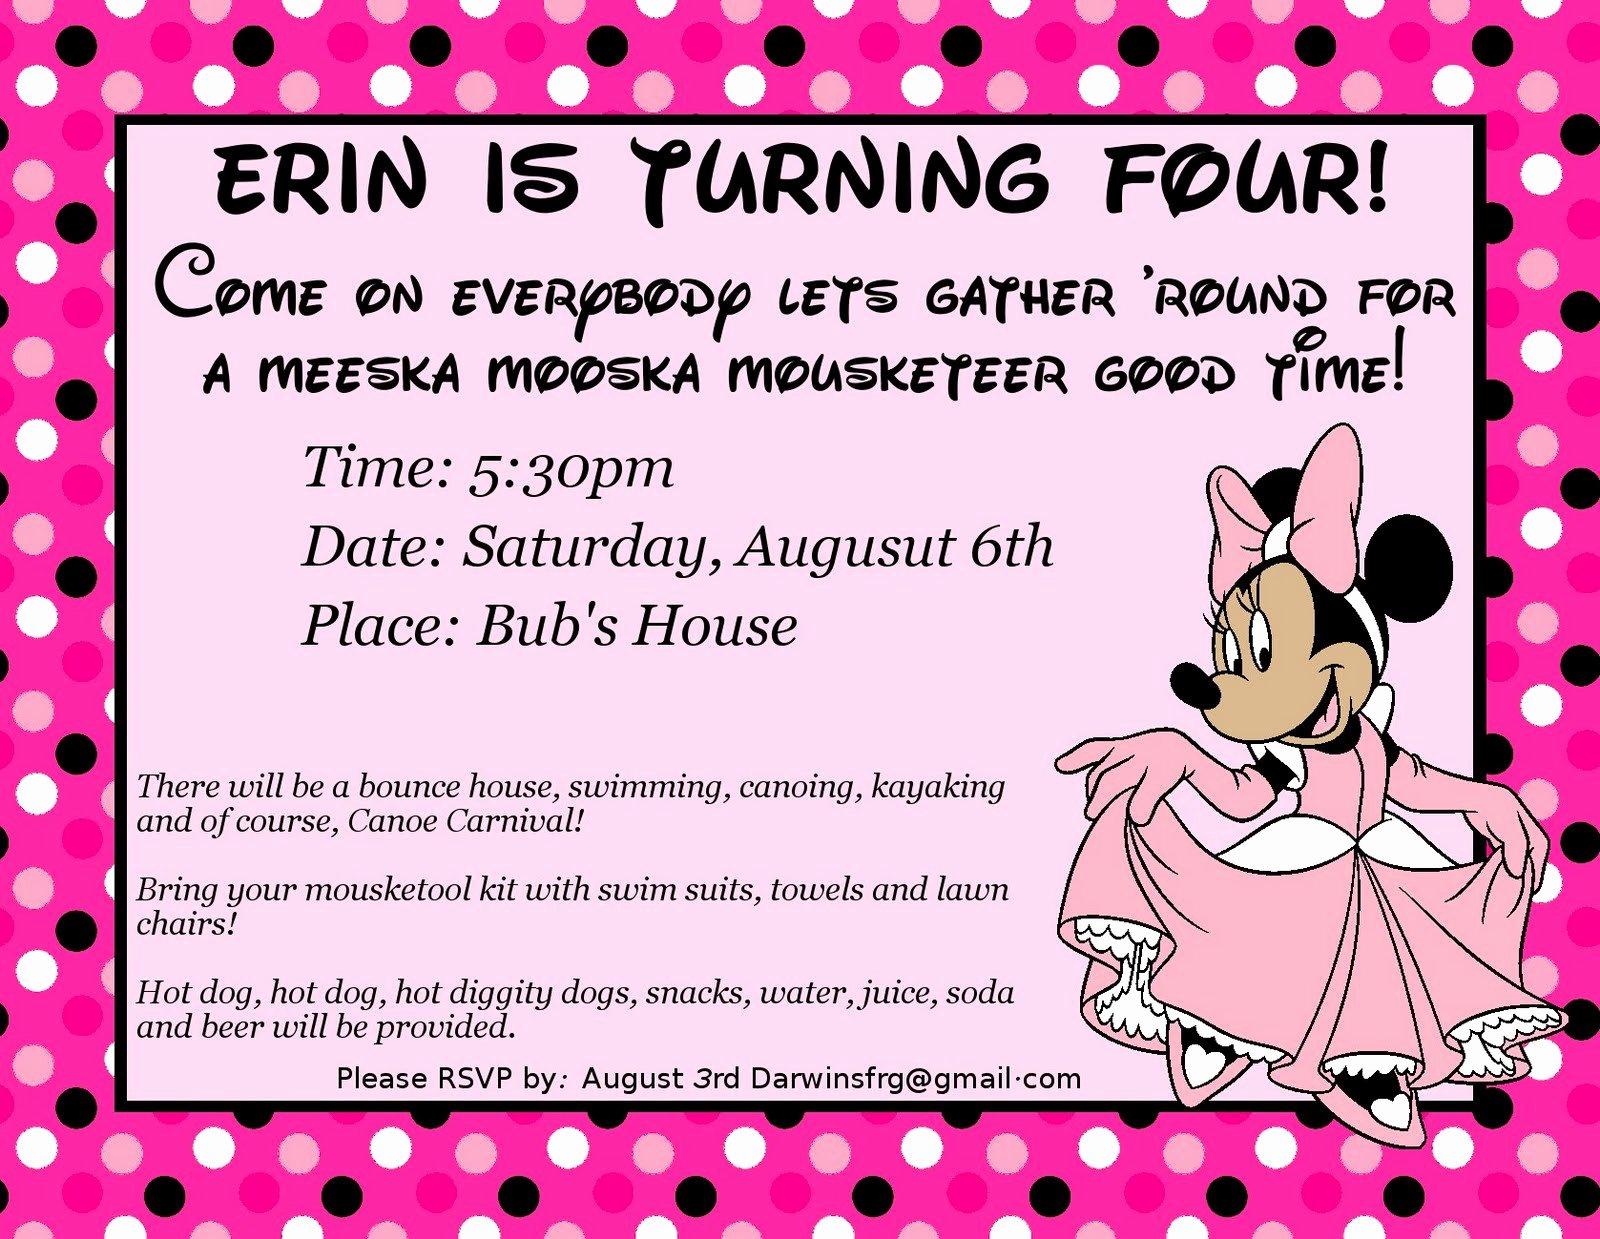 Minnie Mouse Birthday Invitation Wording Unique 4th Birthday Party Invitation Wording